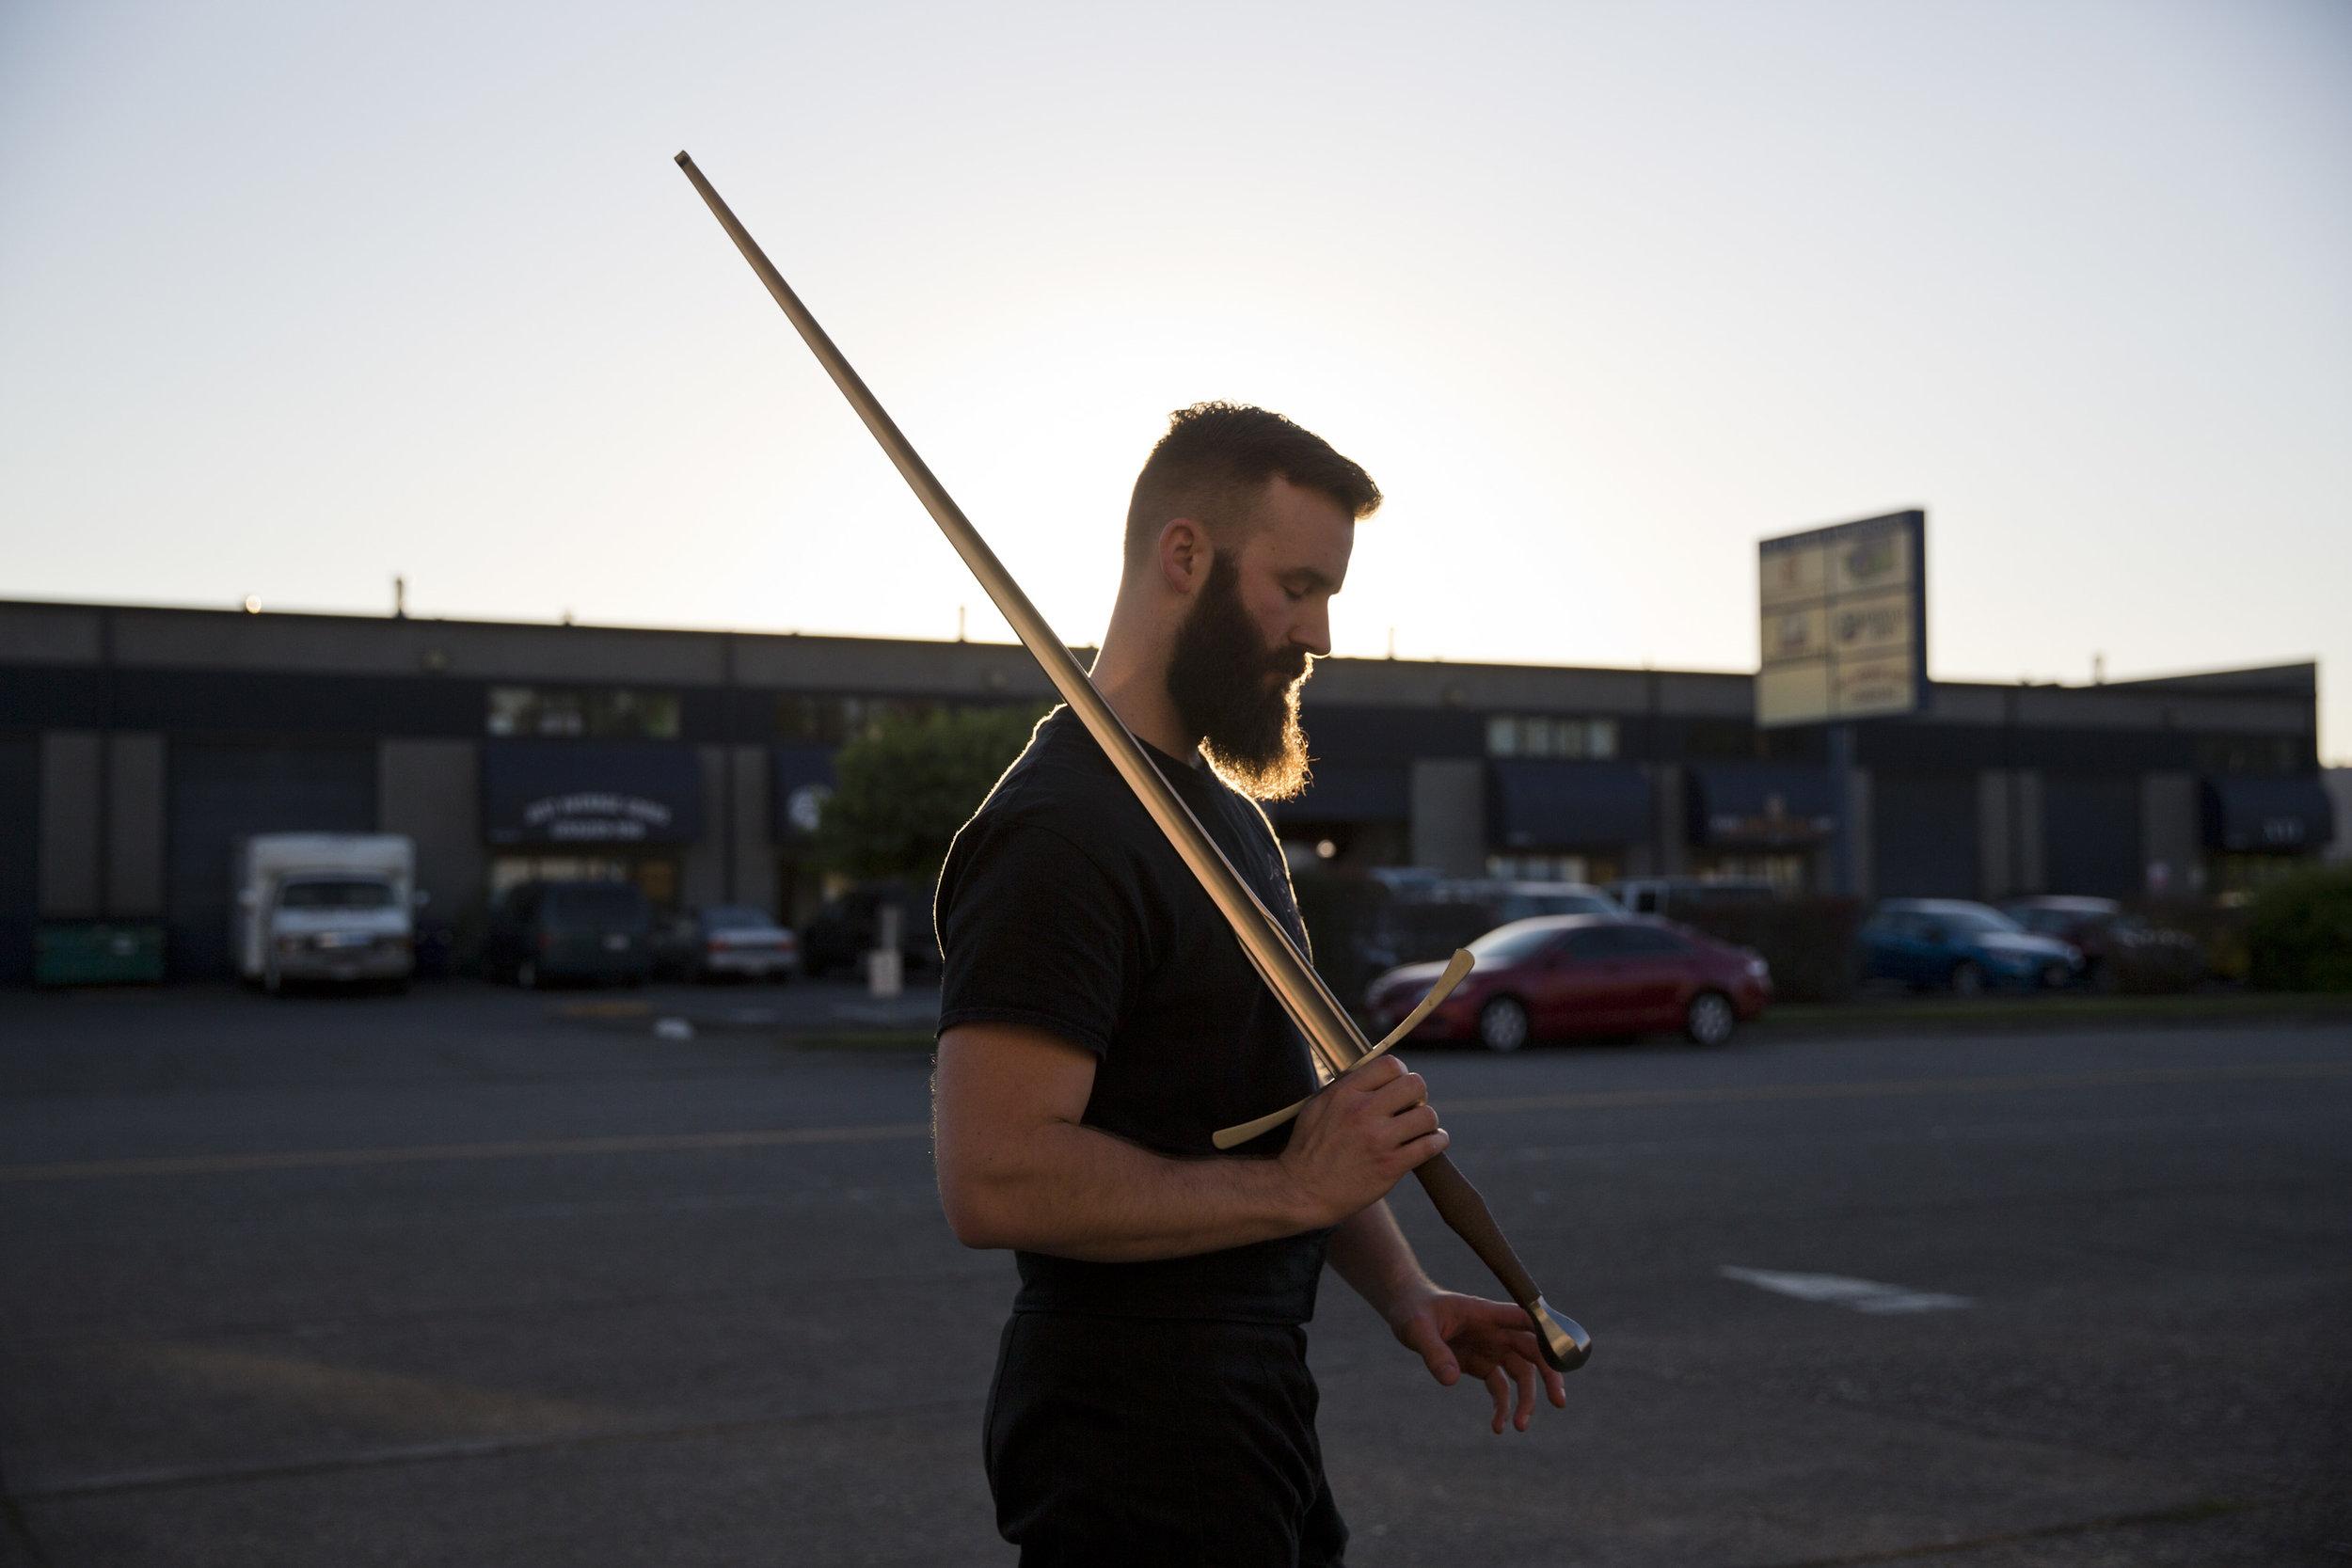 Finally I'm old enough to dress up like a viking and roam around.   Ryan (30), Tacoma.